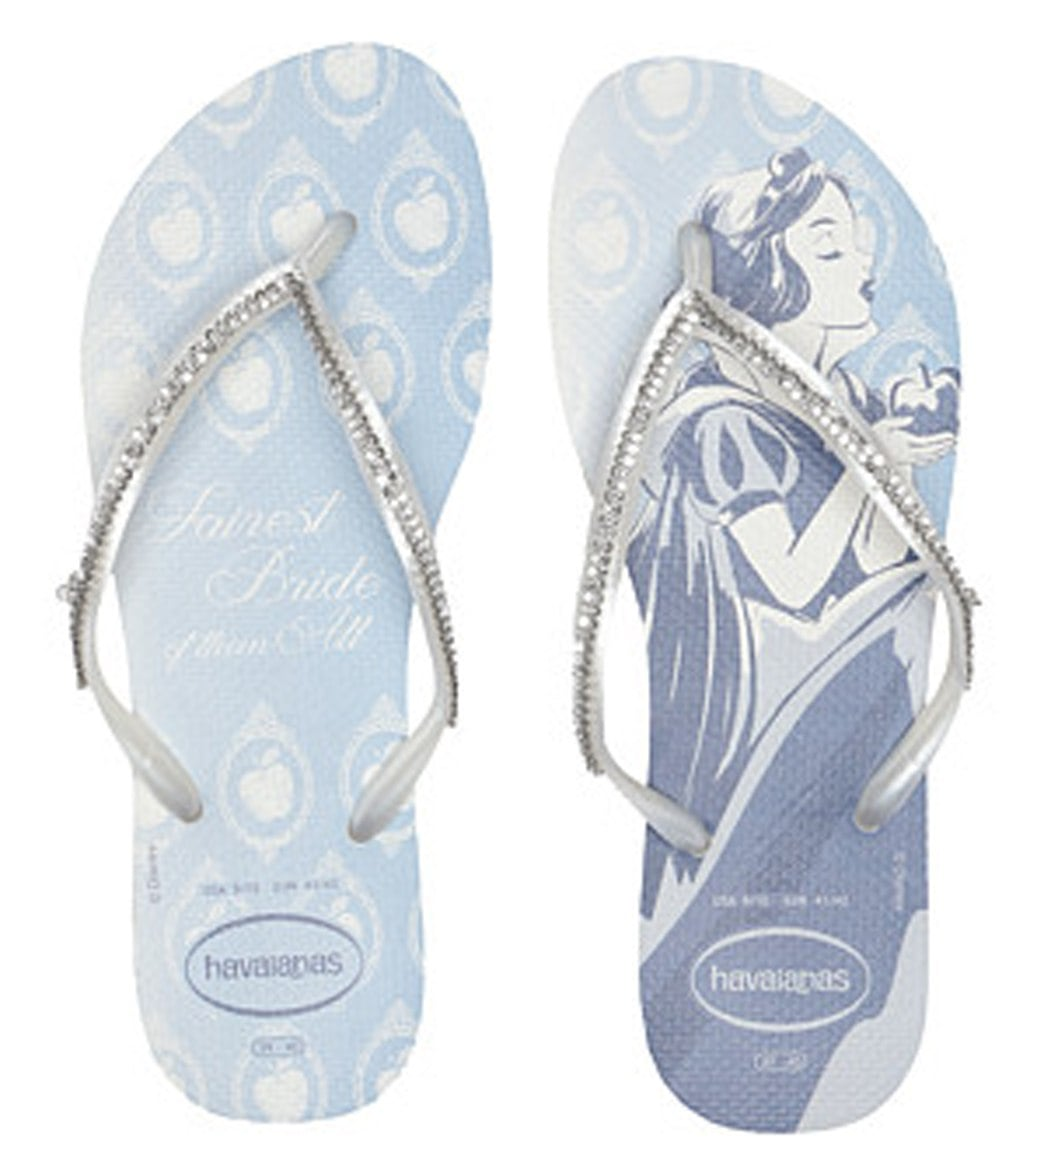 c6e59eaaa578 Havaianas Women s Slim Bridal Snow White Flip Flop at SwimOutlet.com ...